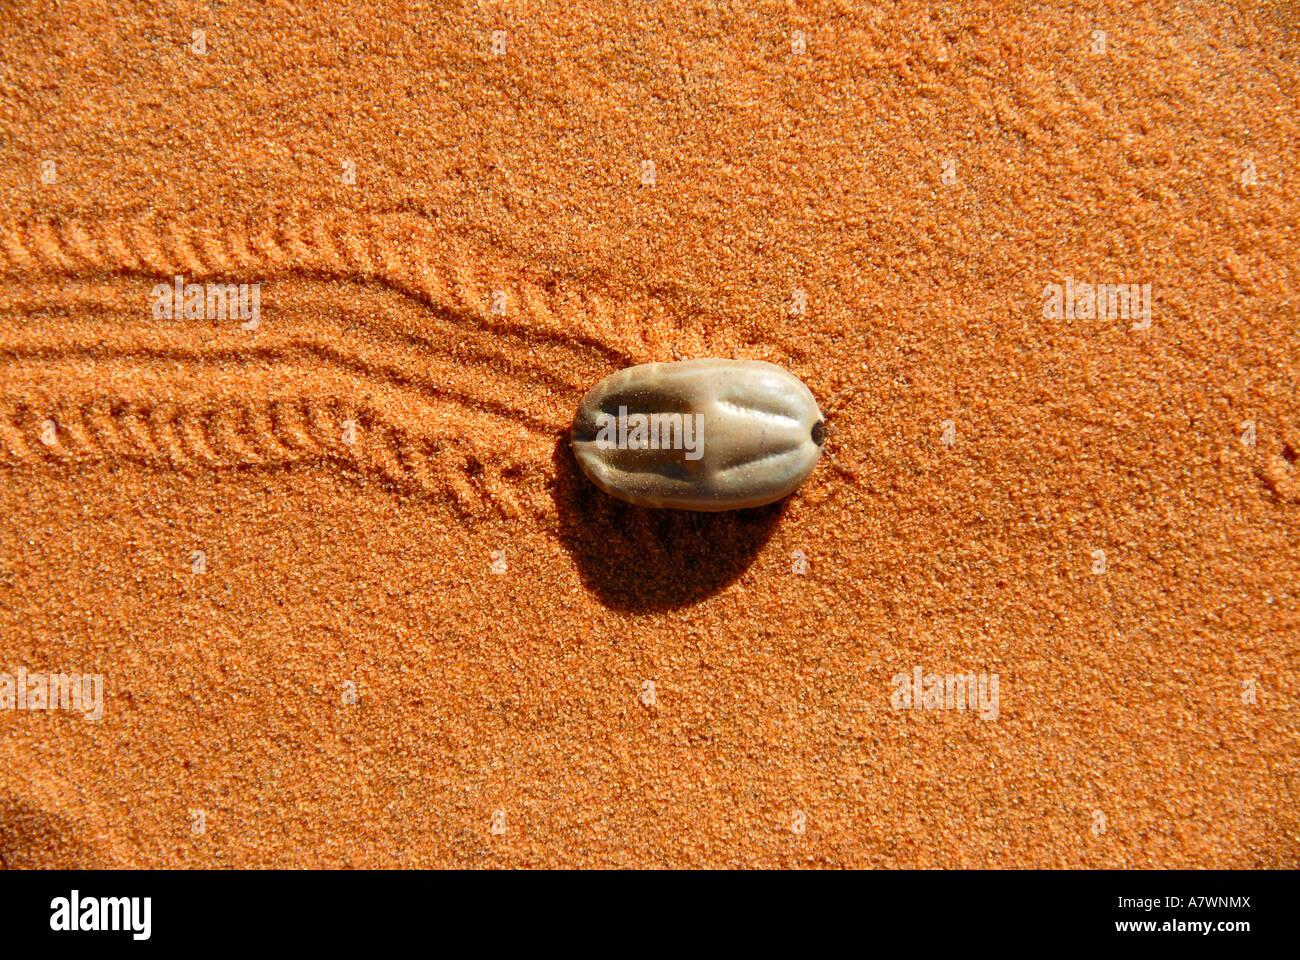 Plump tick runs through the sand and leaves a trace track Erg Chebbi Merzouga Morocco - Stock Image